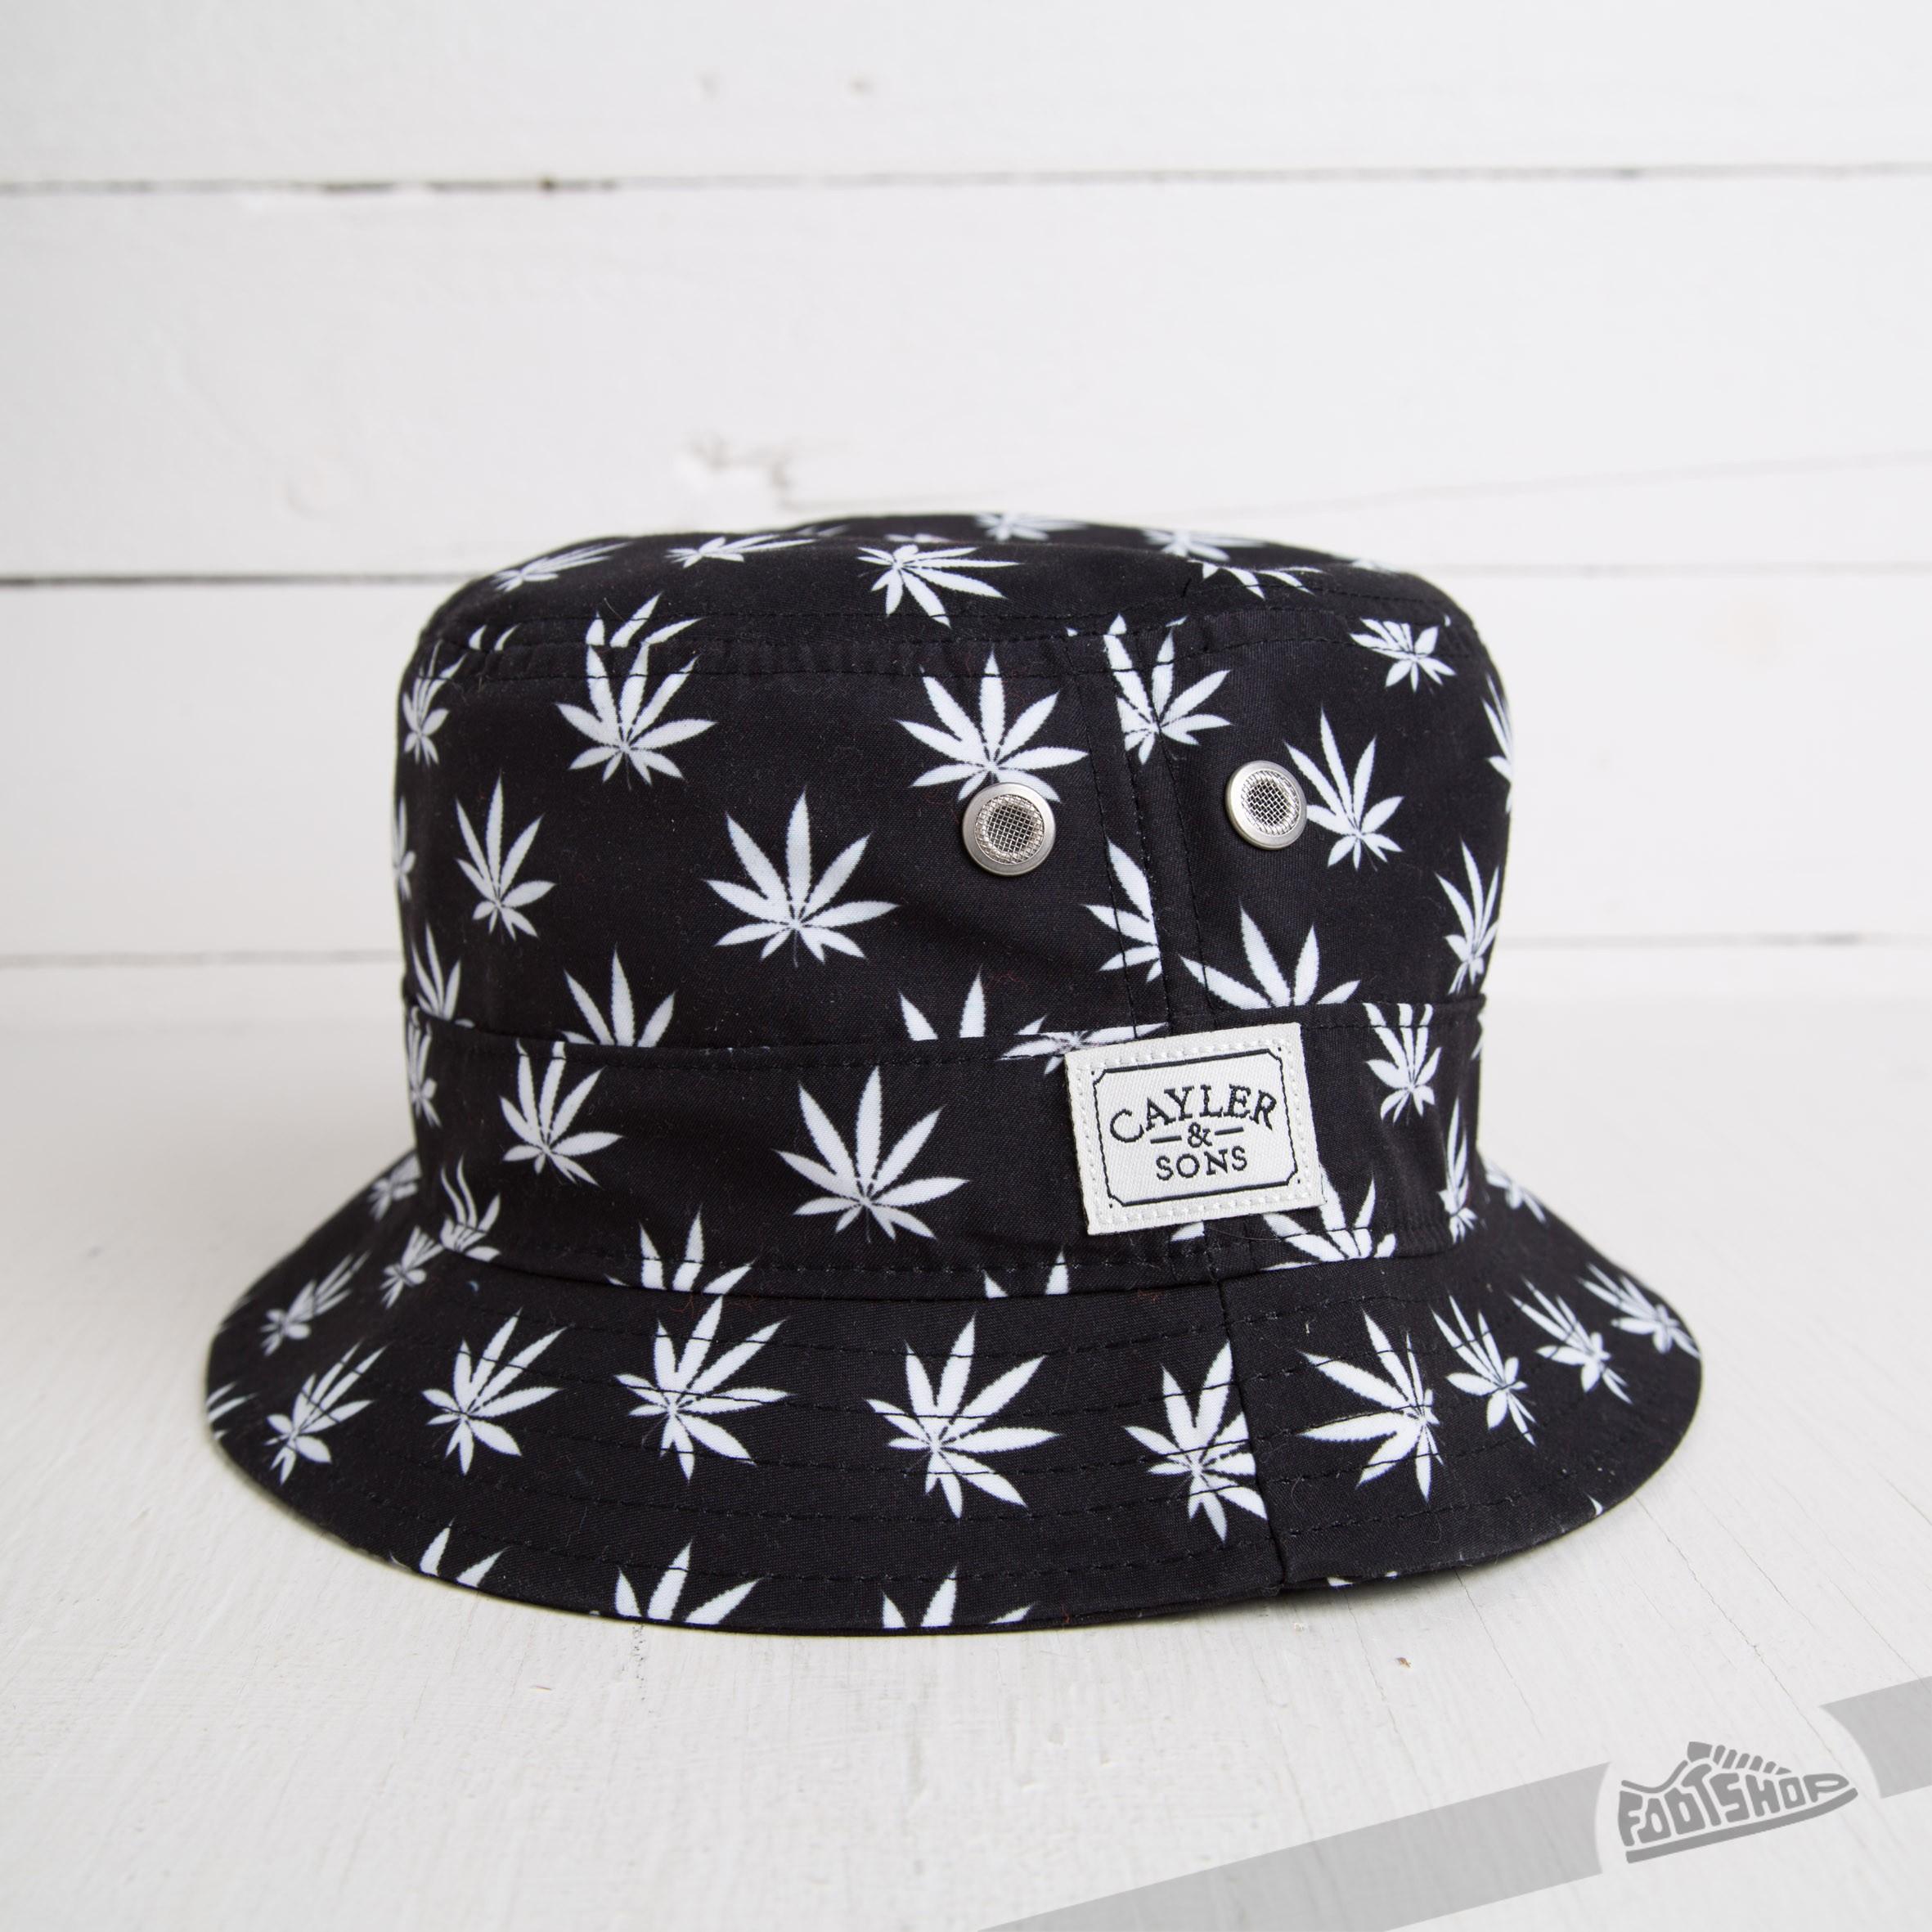 fbefad111ea Cayler   Sons Budz n Stripes Bucket Hat Black White